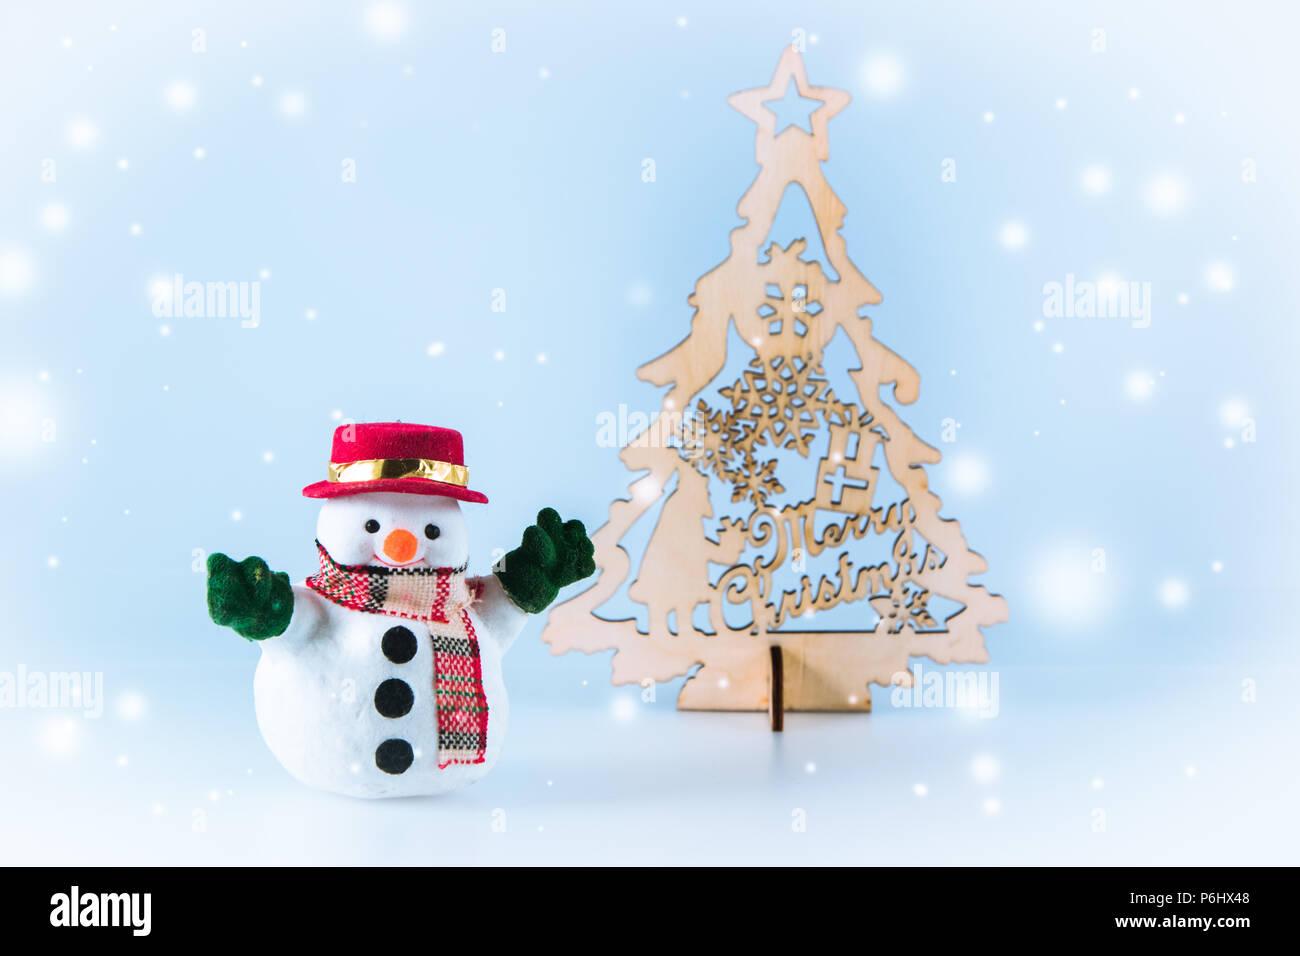 snowman near christmas tree on white background snow flake is falling down - White Christmas Tree Snowman